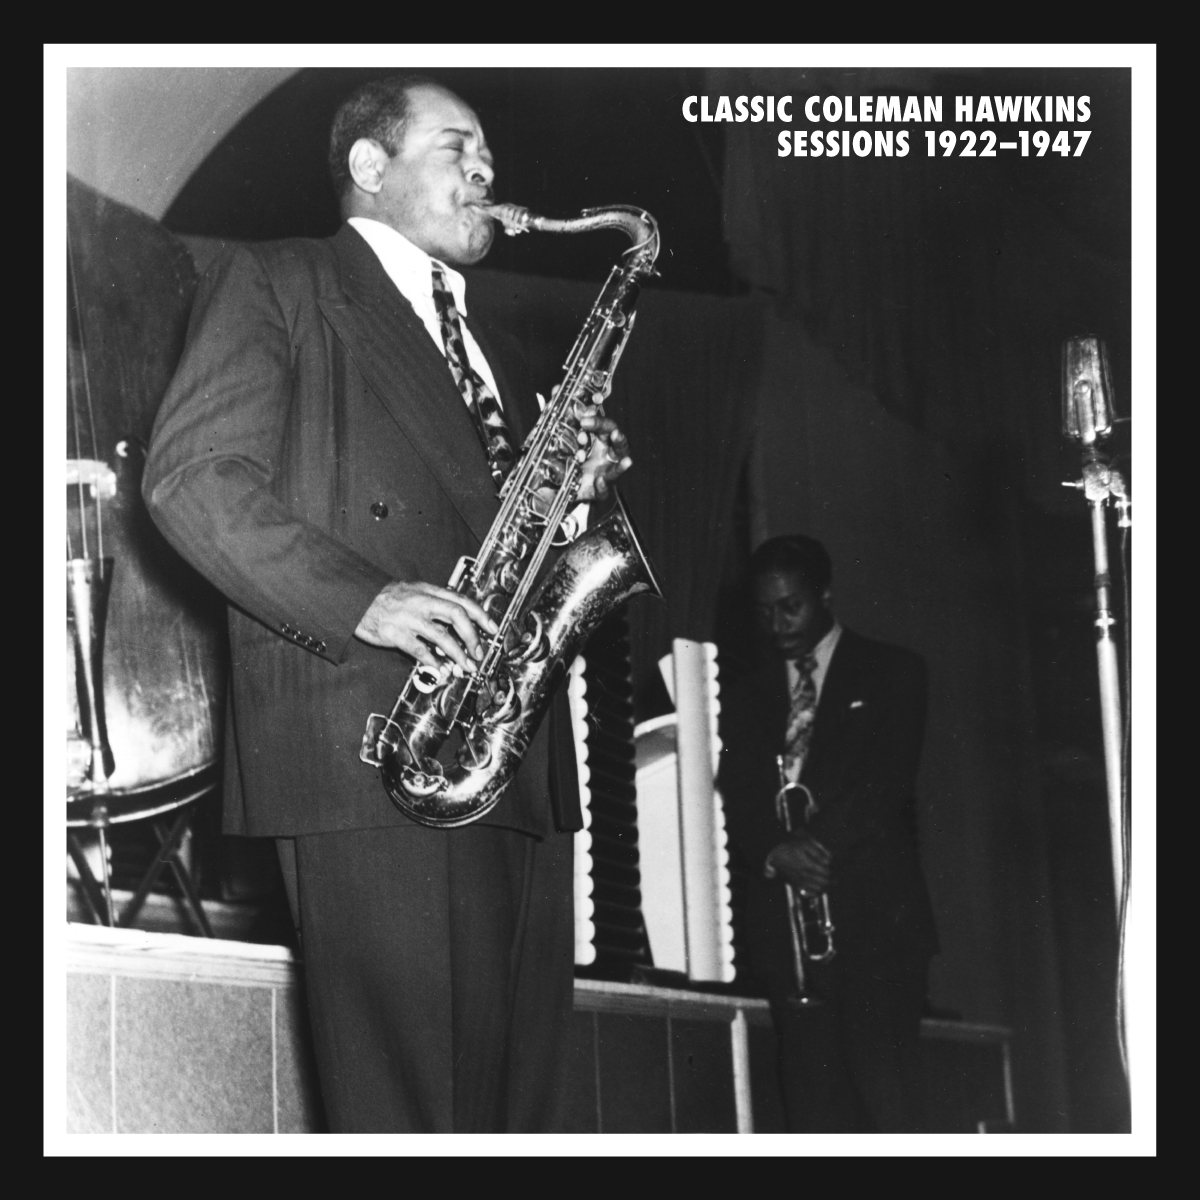 Classic Coleman Hawkins Sessions 1922-1947